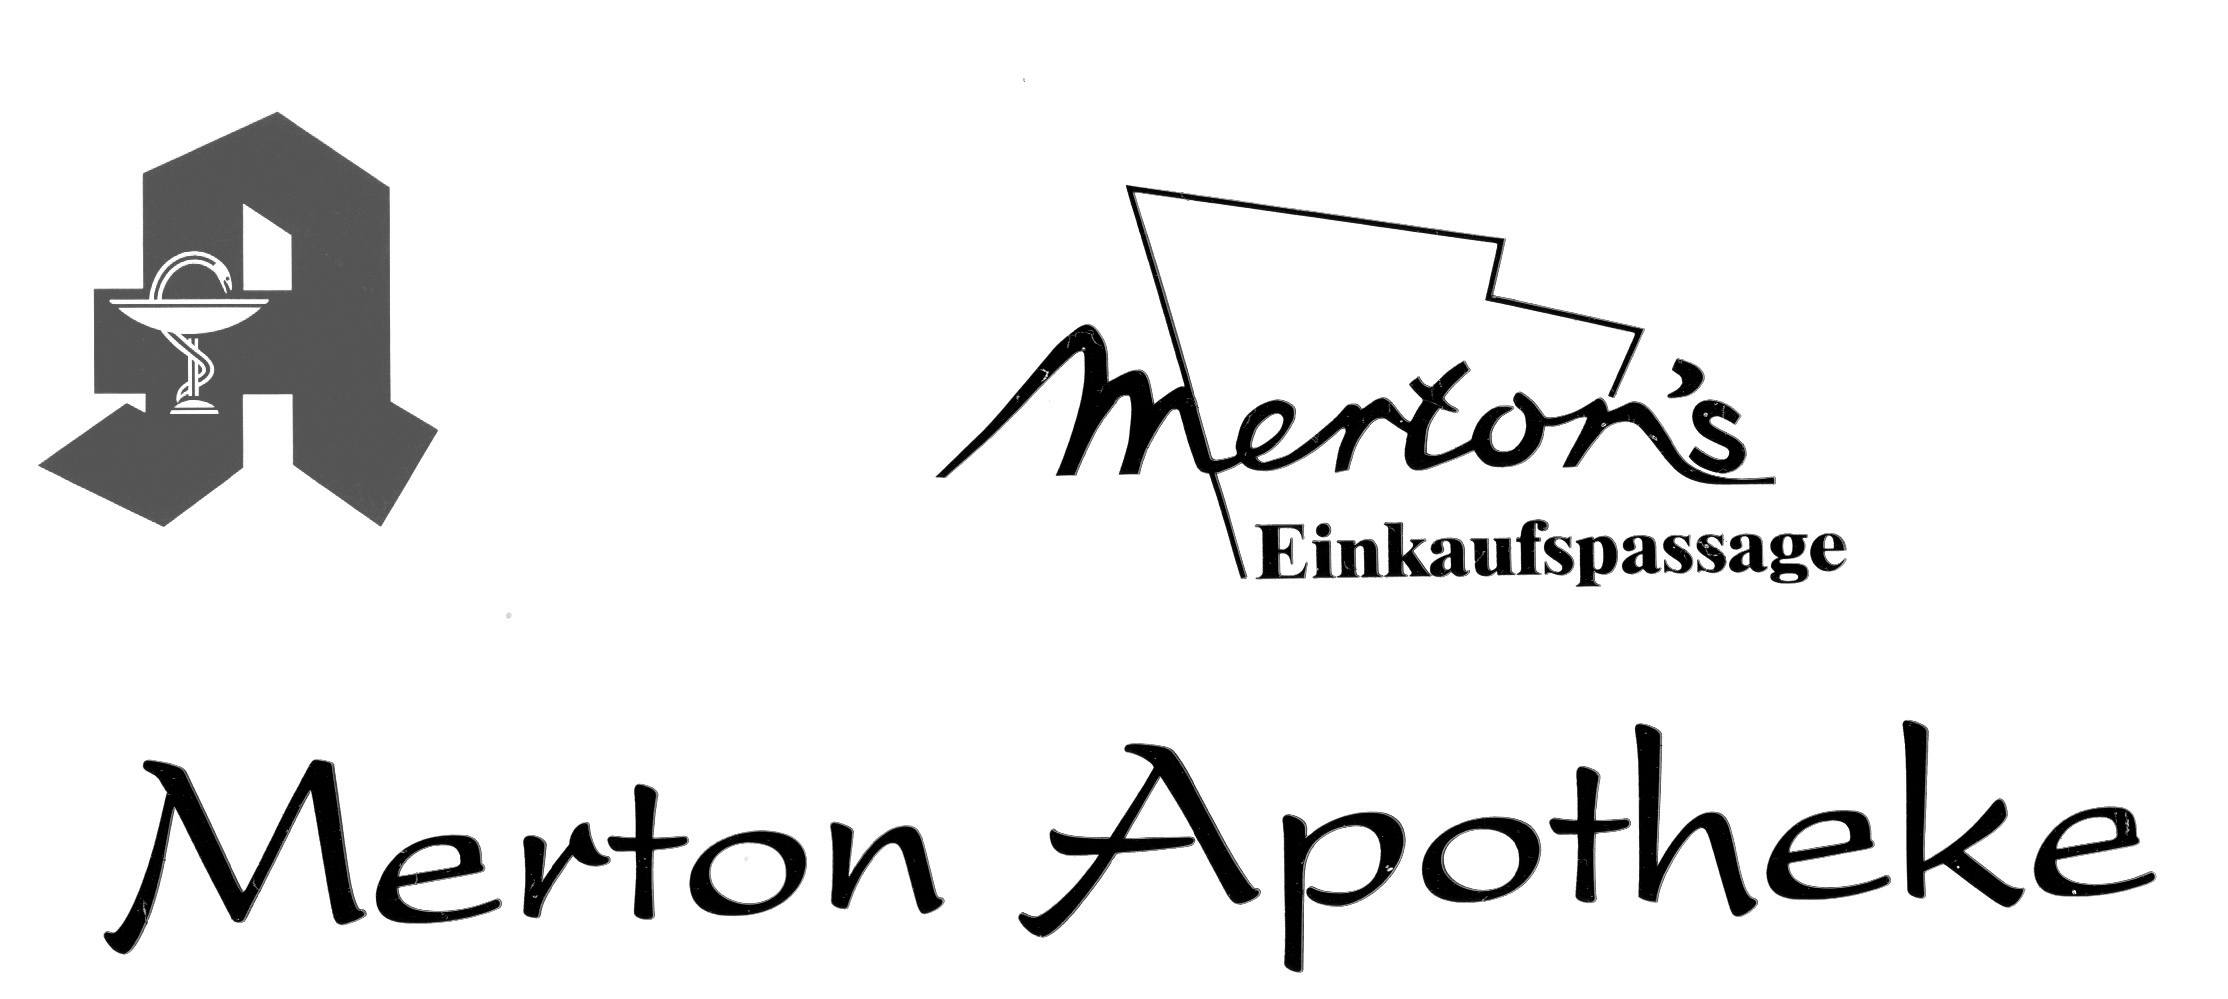 Logo Mertonapotheke sw - Home